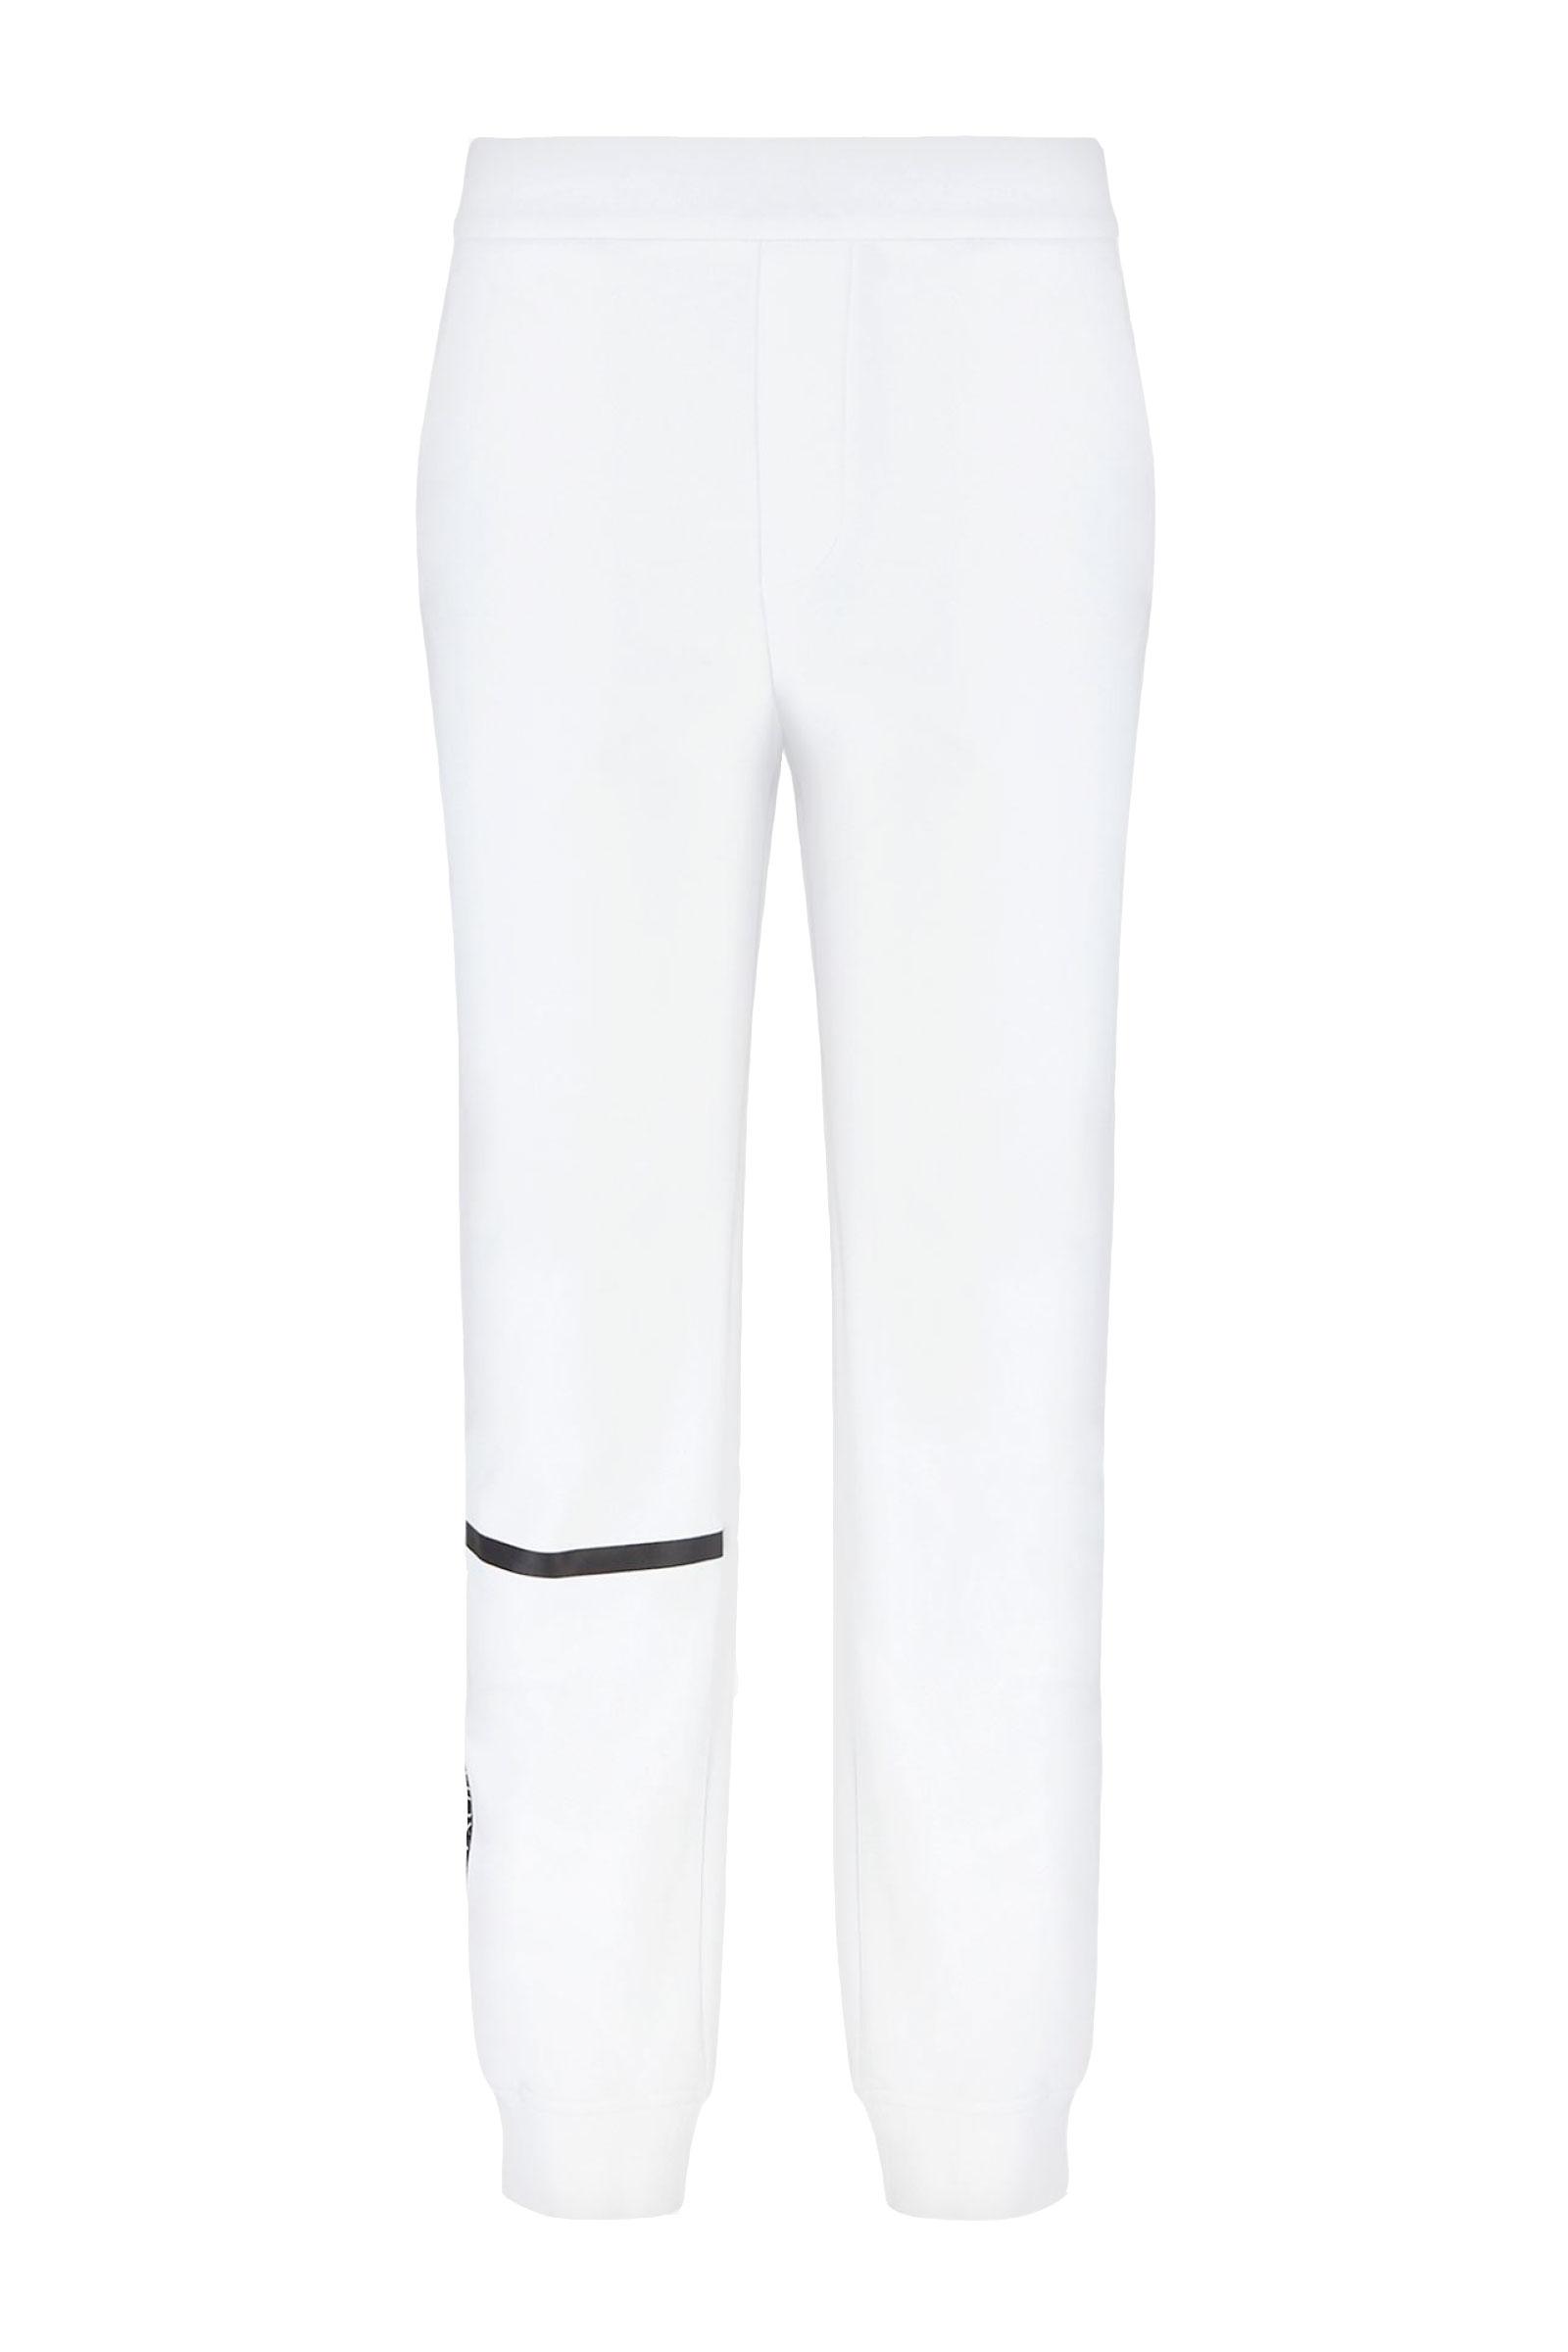 ARMANI EXCHANGE | Trousers | 3KZPFE ZJ9FZ1100